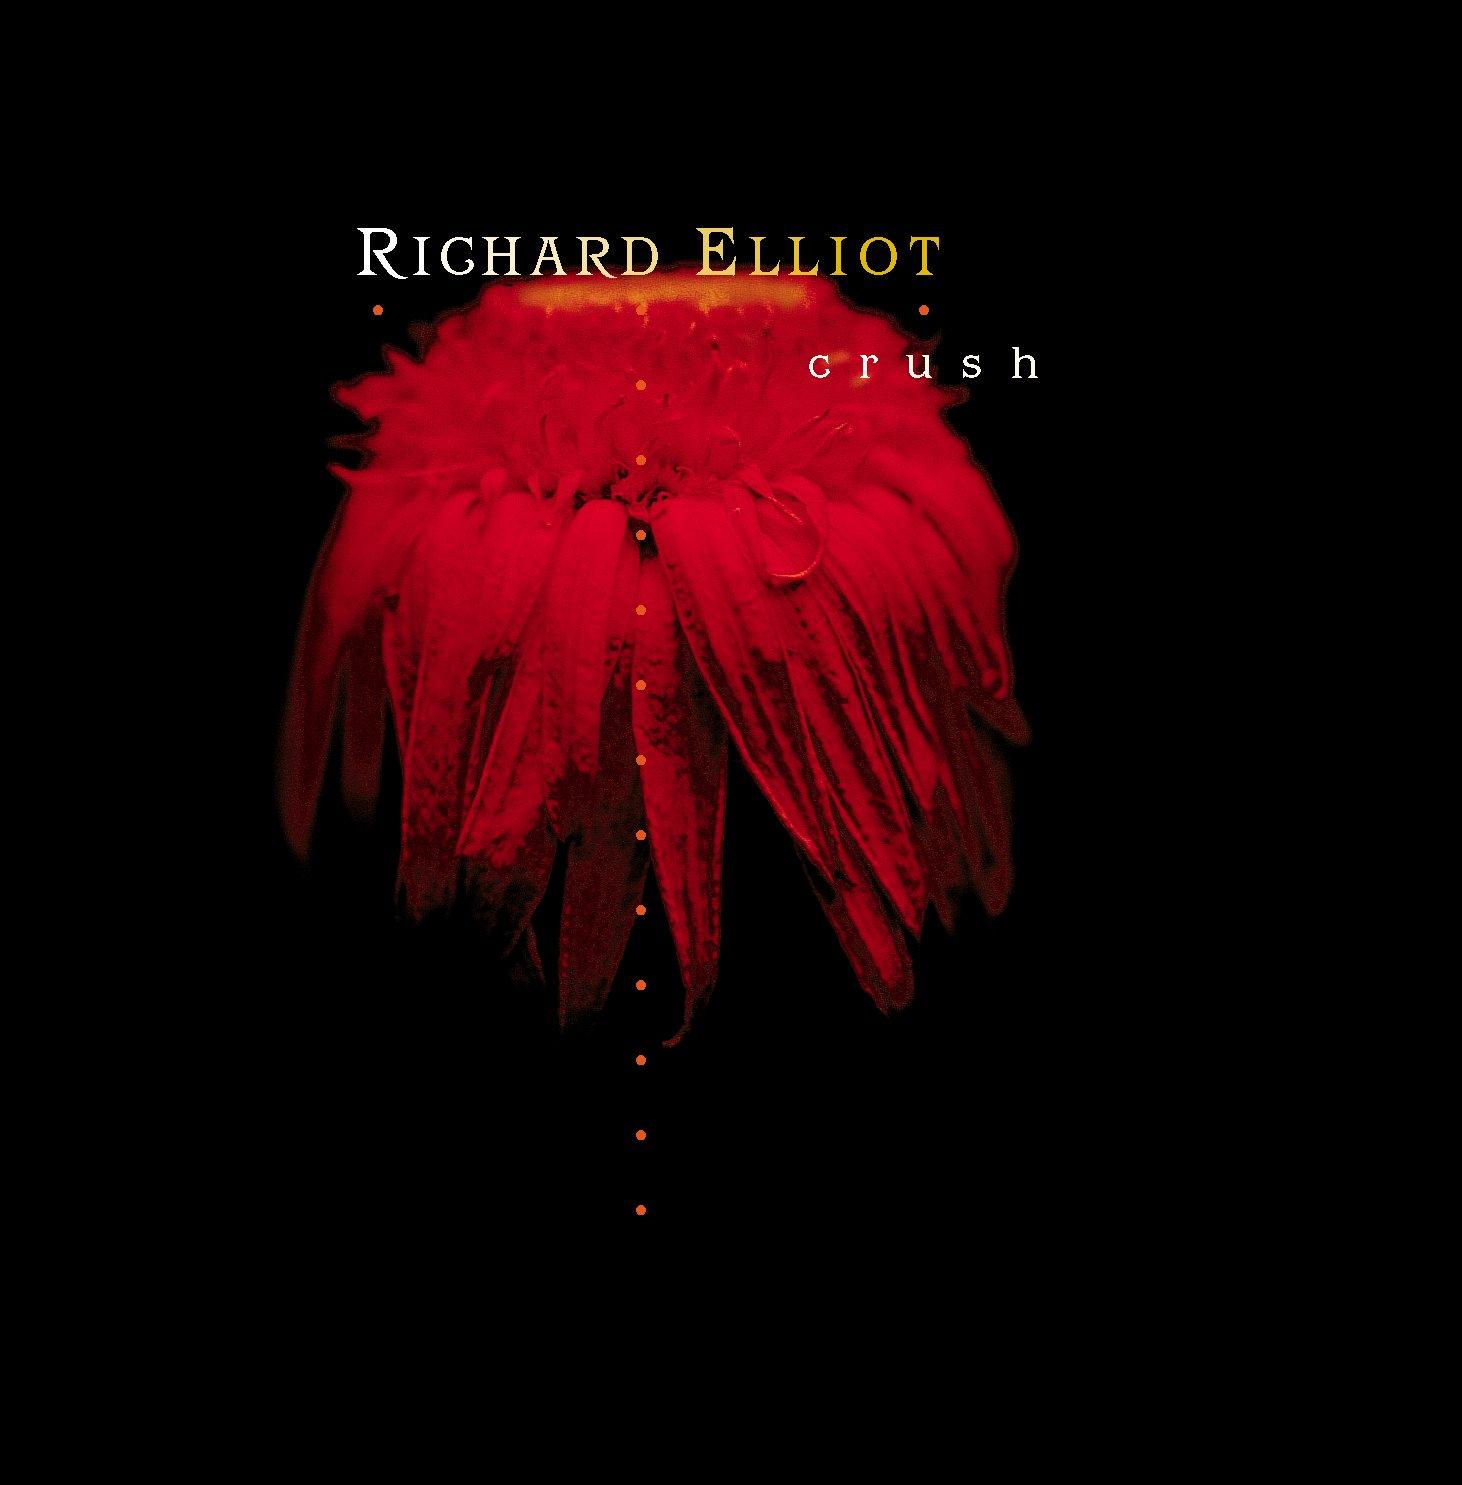 Richard Elliot - Crush (2001) [FLAC] Download